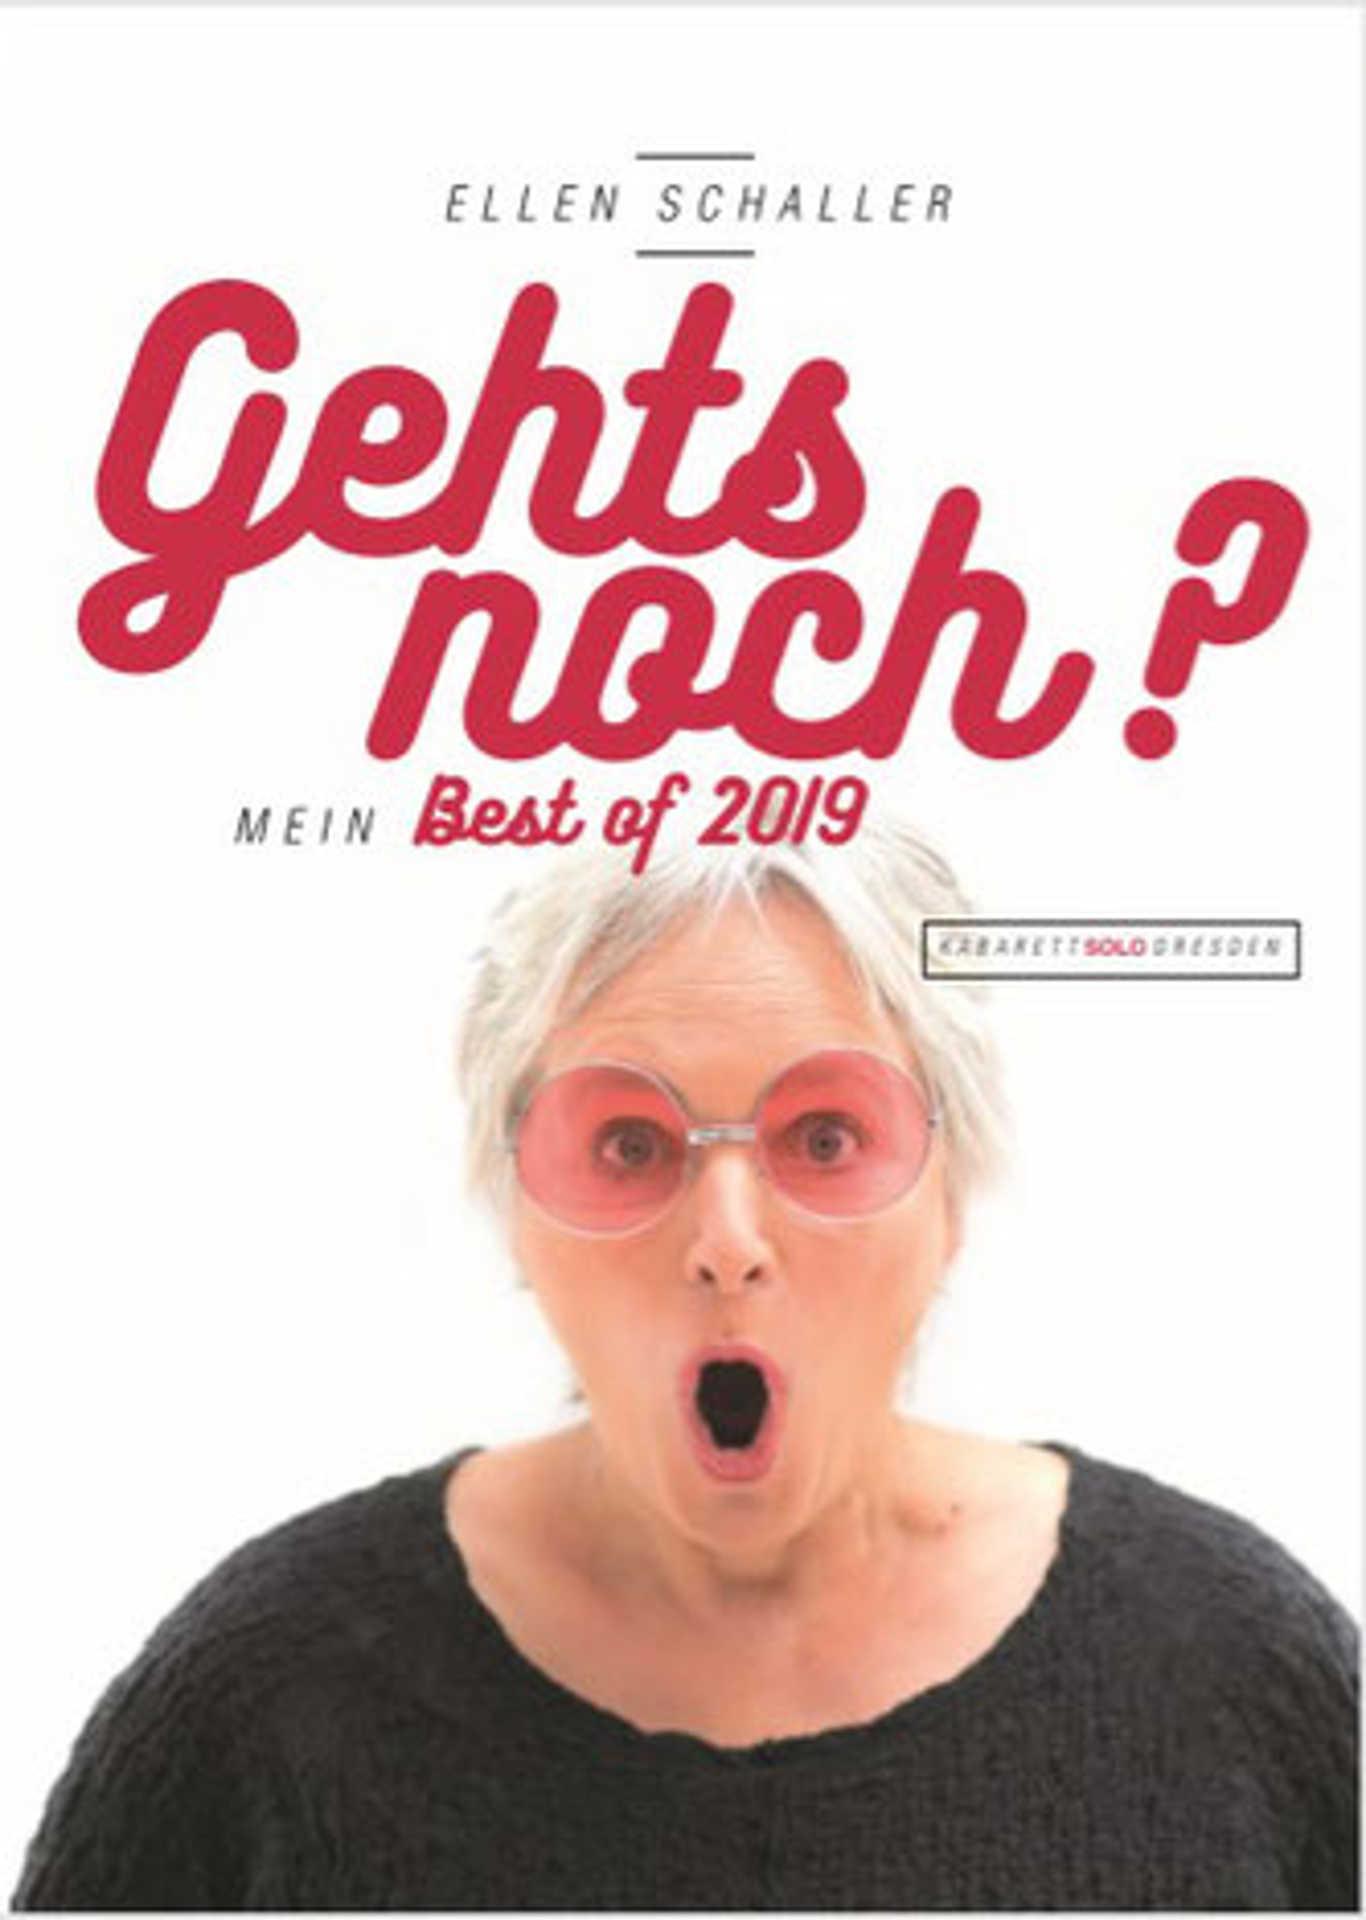 """Gehts noch?"" Mein Best of 2019 - Ellen Schaller"